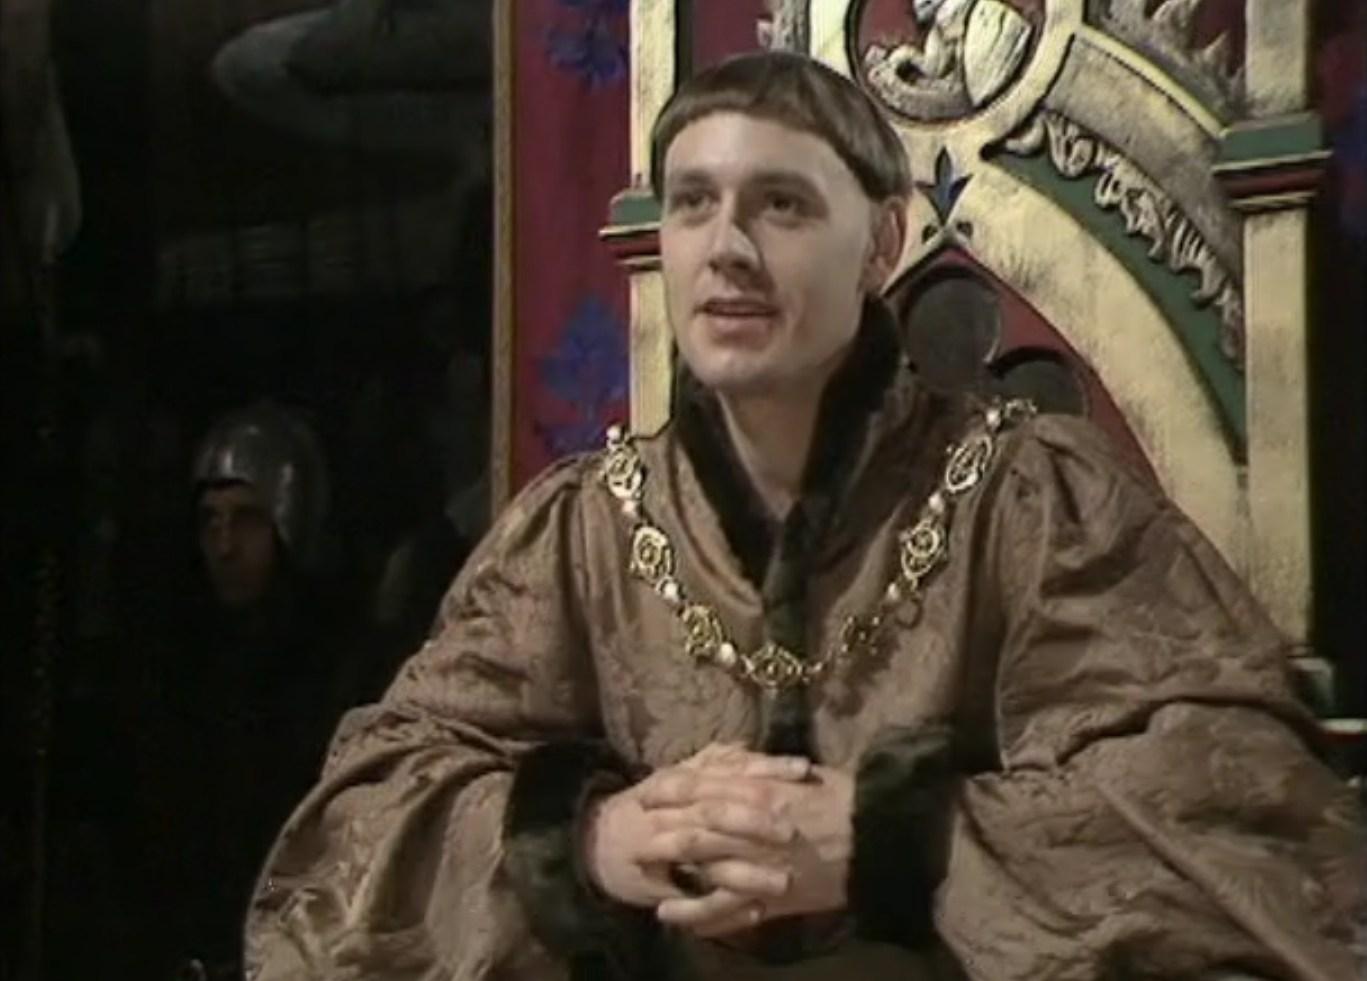 Henry V Throughout History: The Poring Dark – On TV